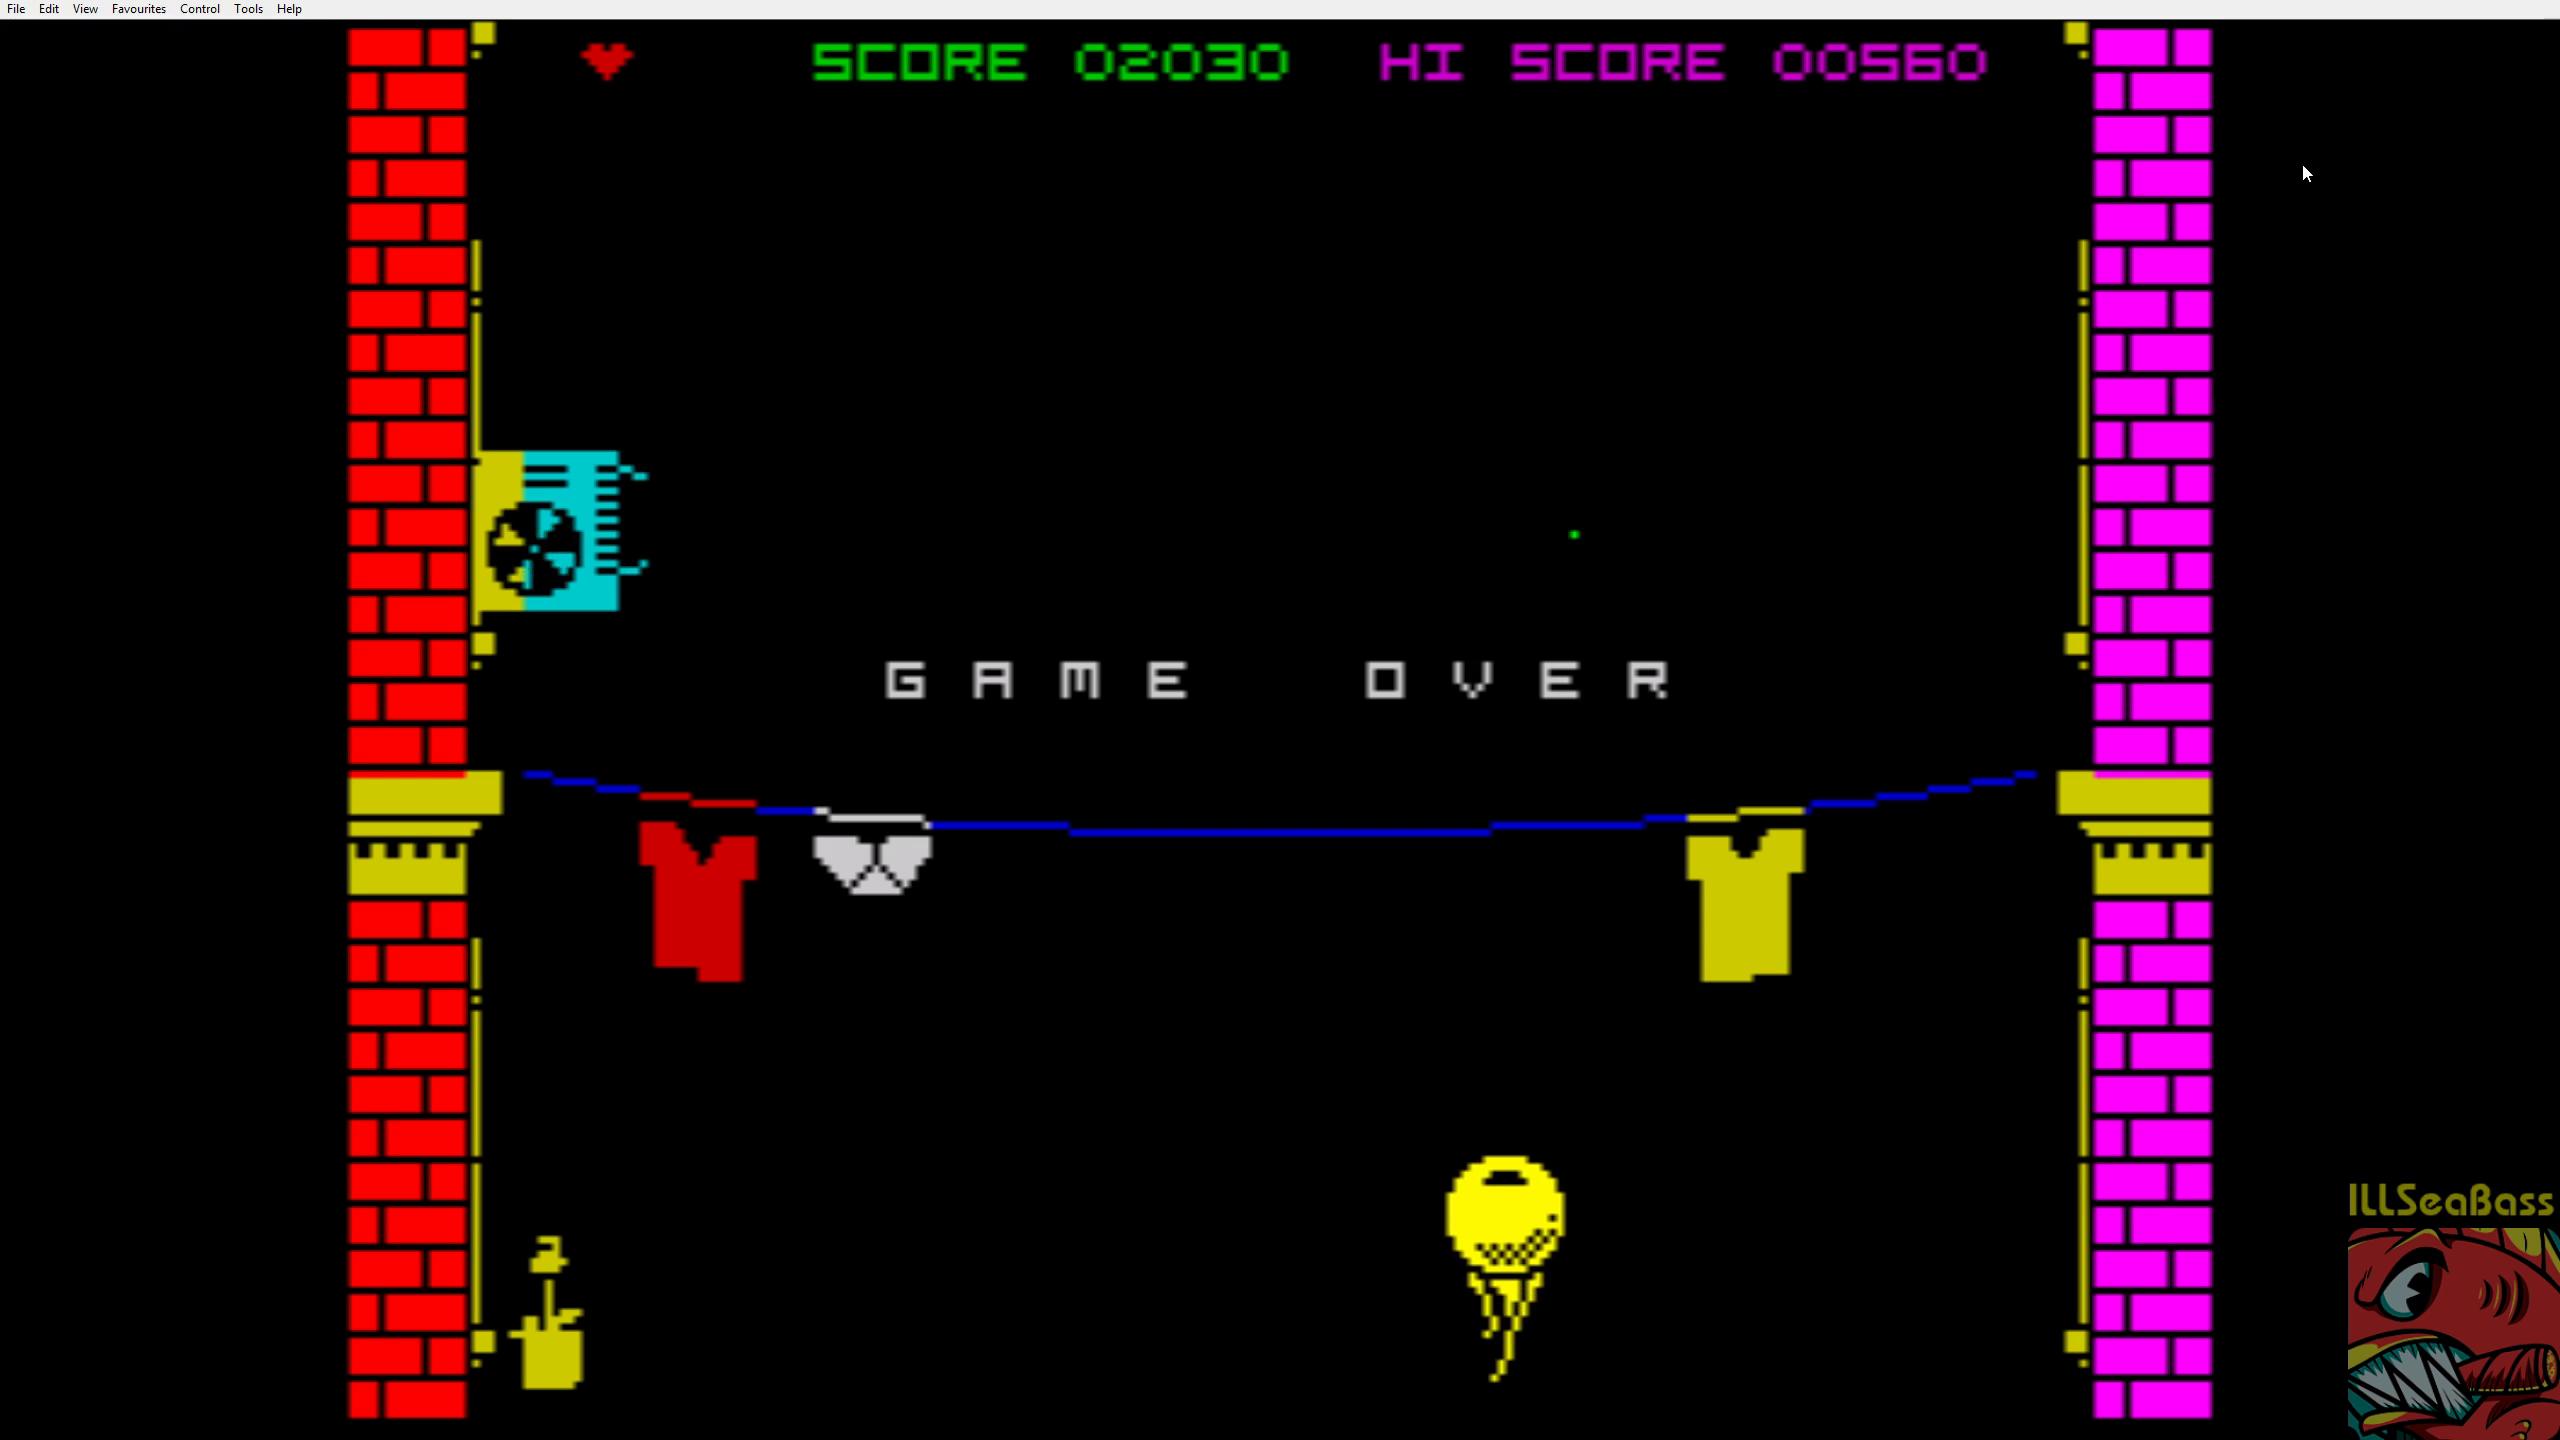 ILLSeaBass: Nohzdyve (ZX Spectrum Emulated) 2,030 points on 2019-01-10 08:59:17